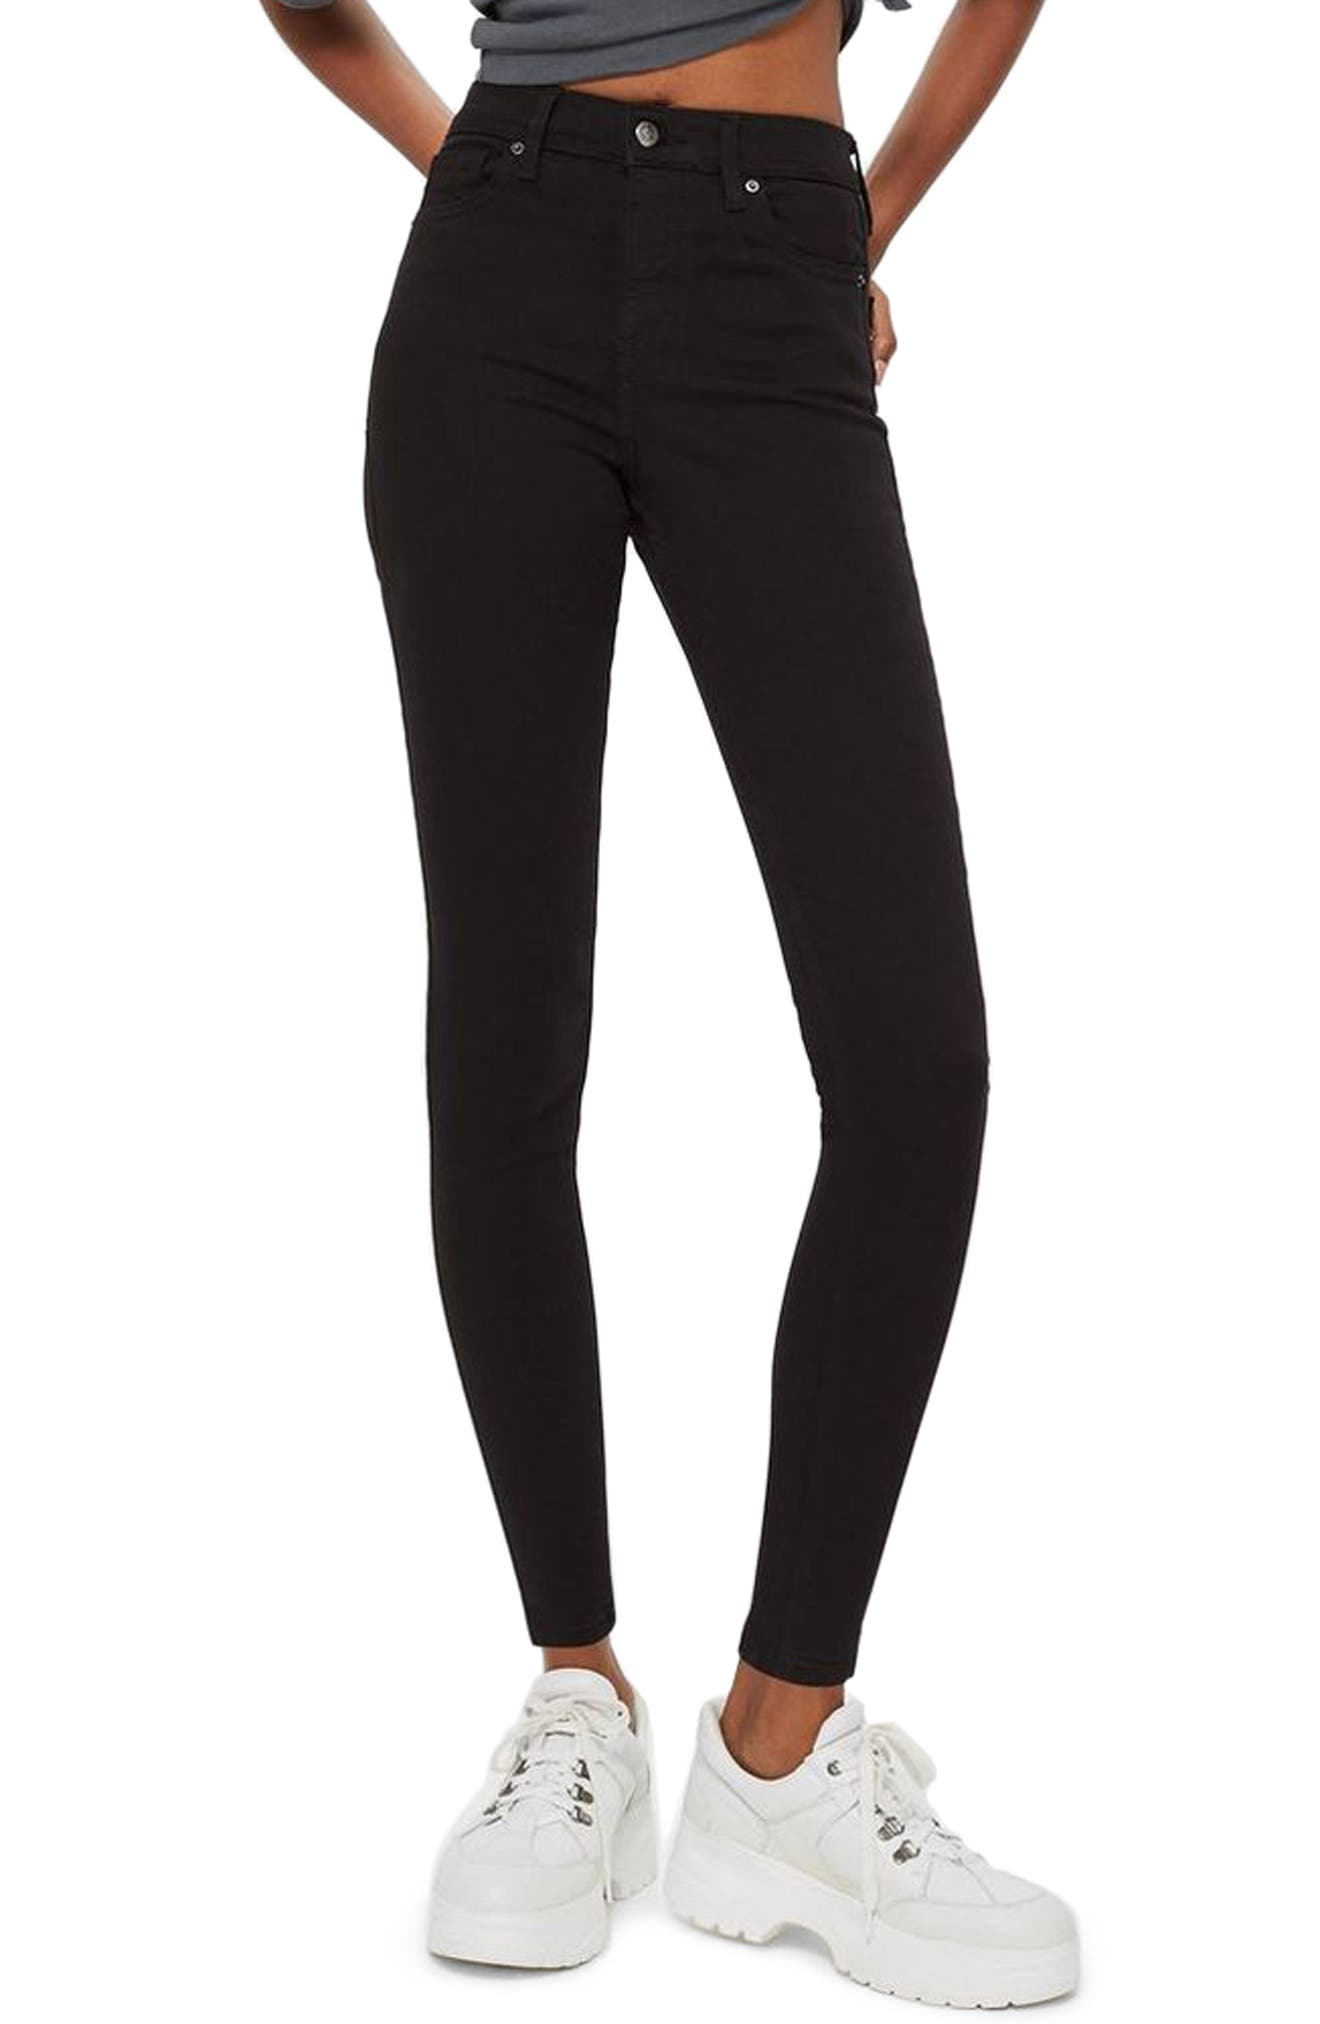 Topshop Jamie High Waist Black Jeans (Regular & Petite)